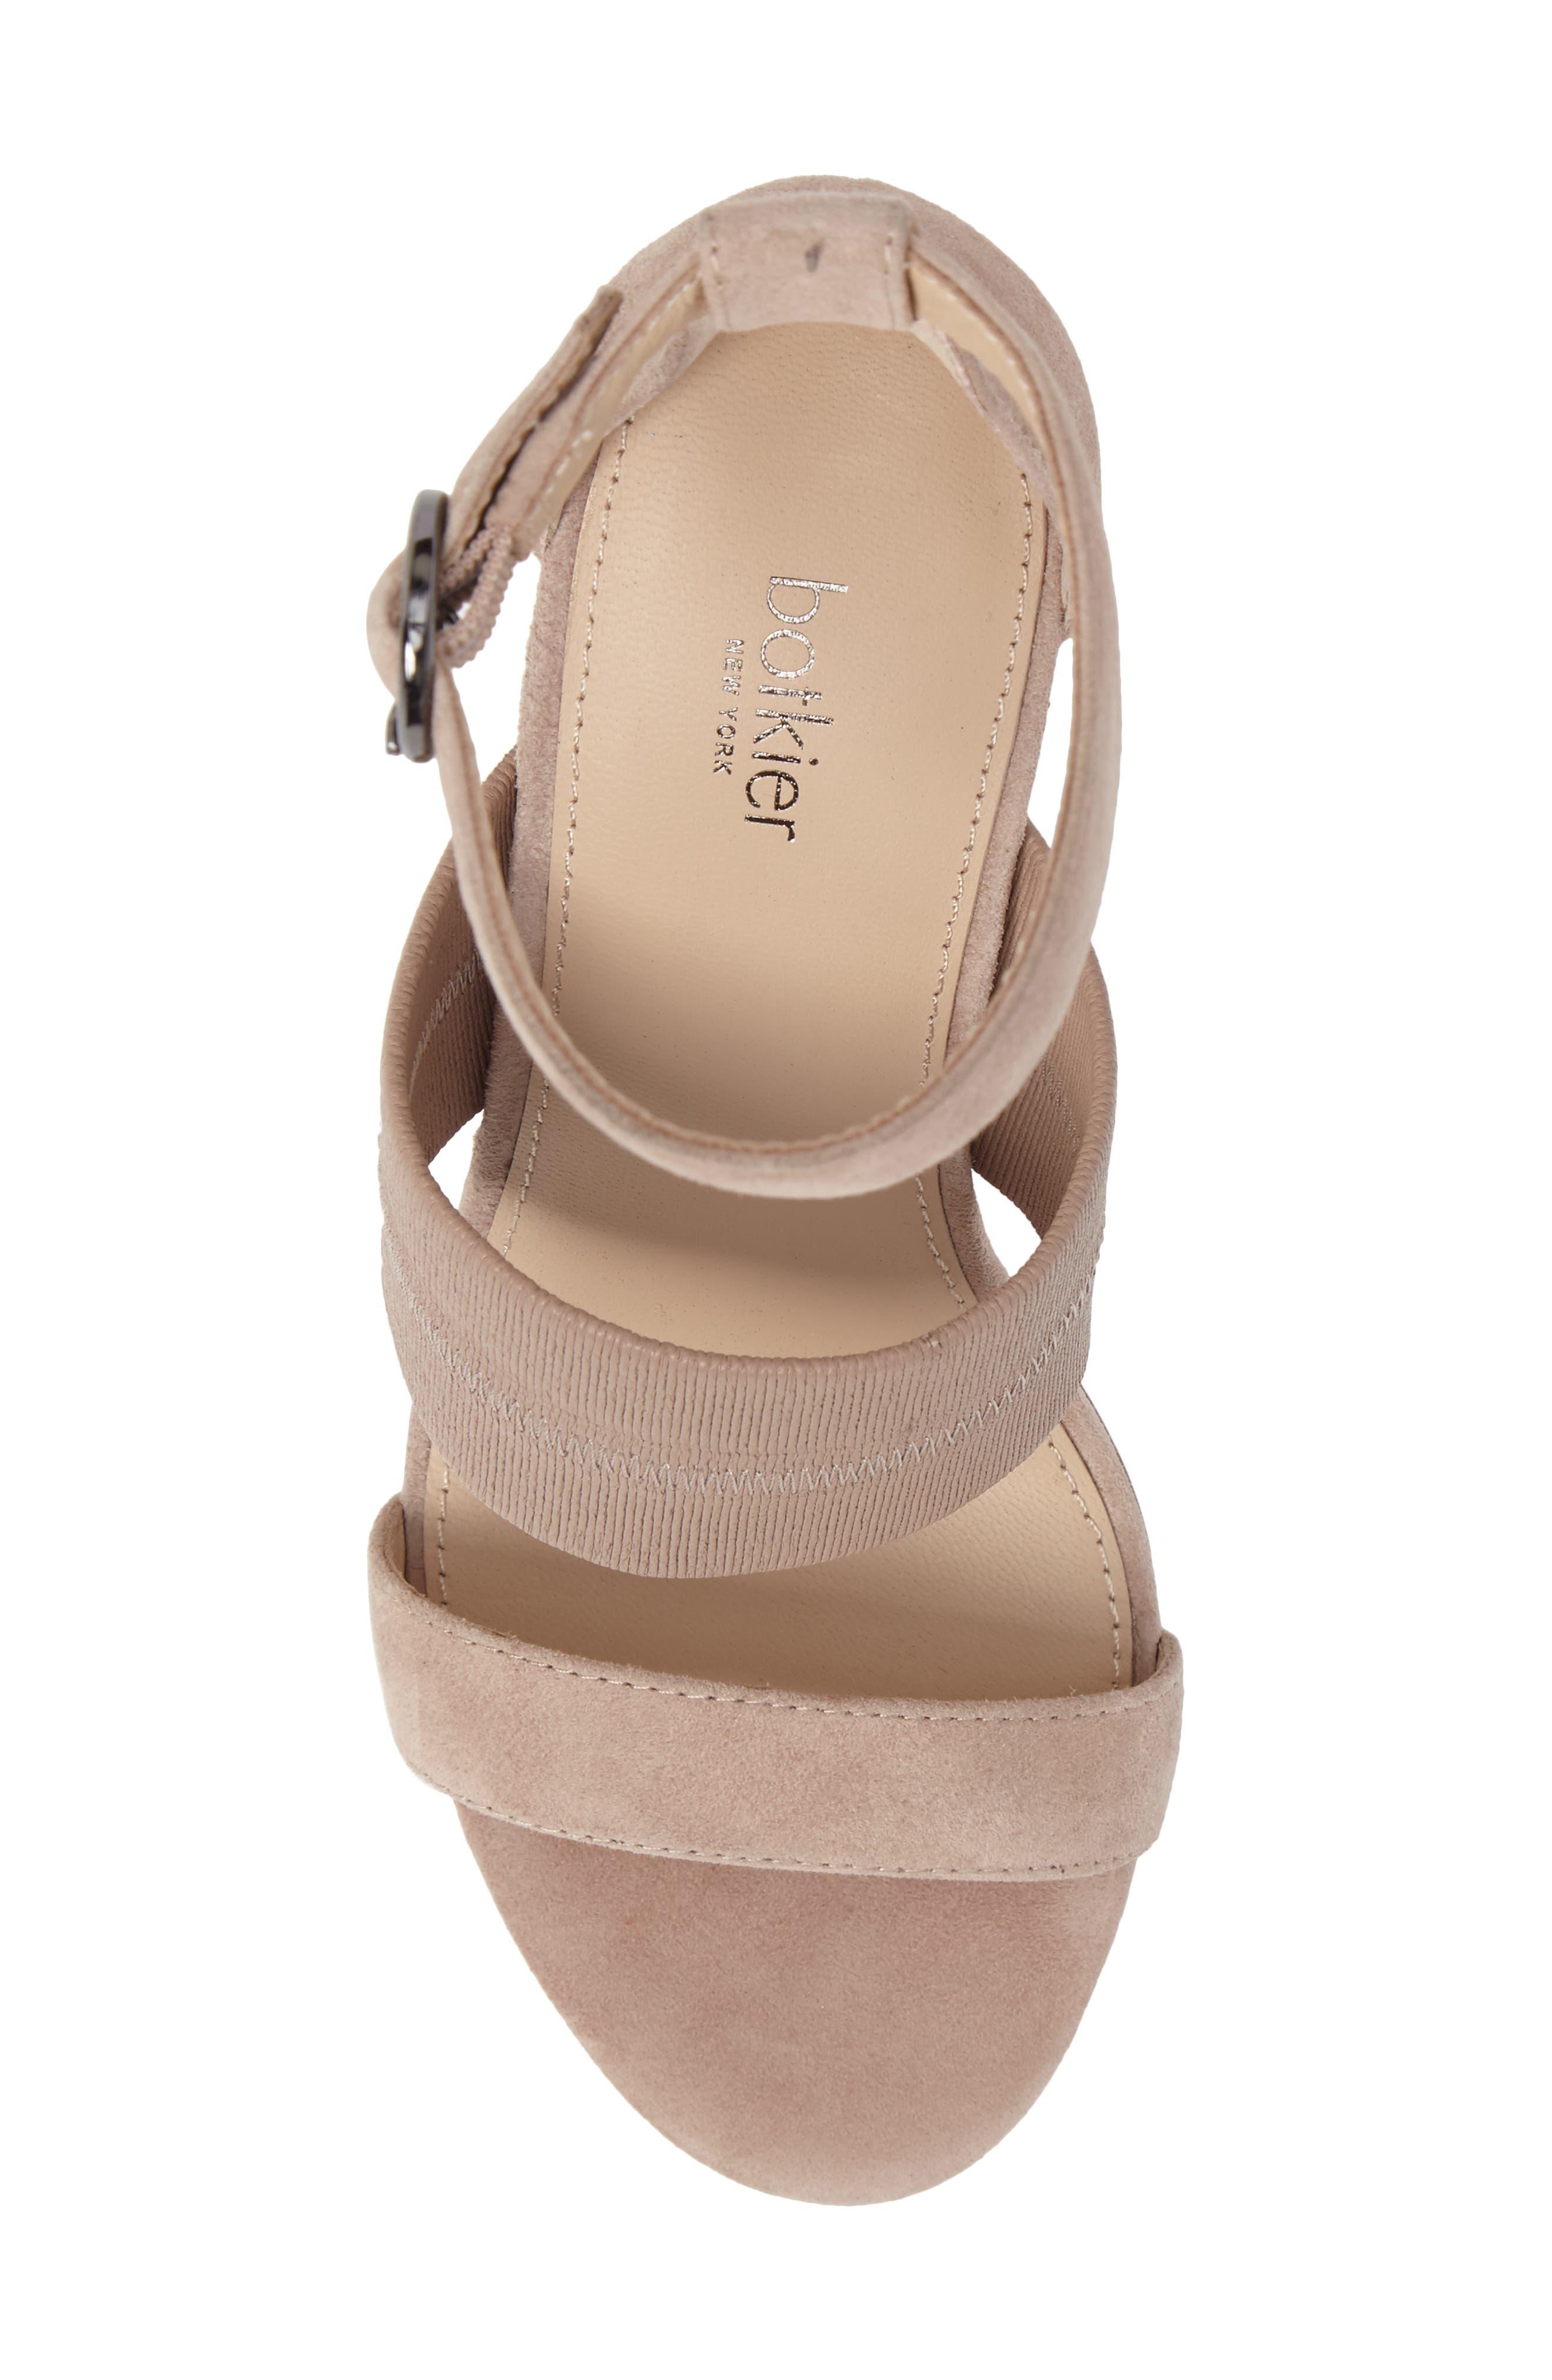 Gisella Ankle Strap Sandal,                             Alternate thumbnail 10, color,